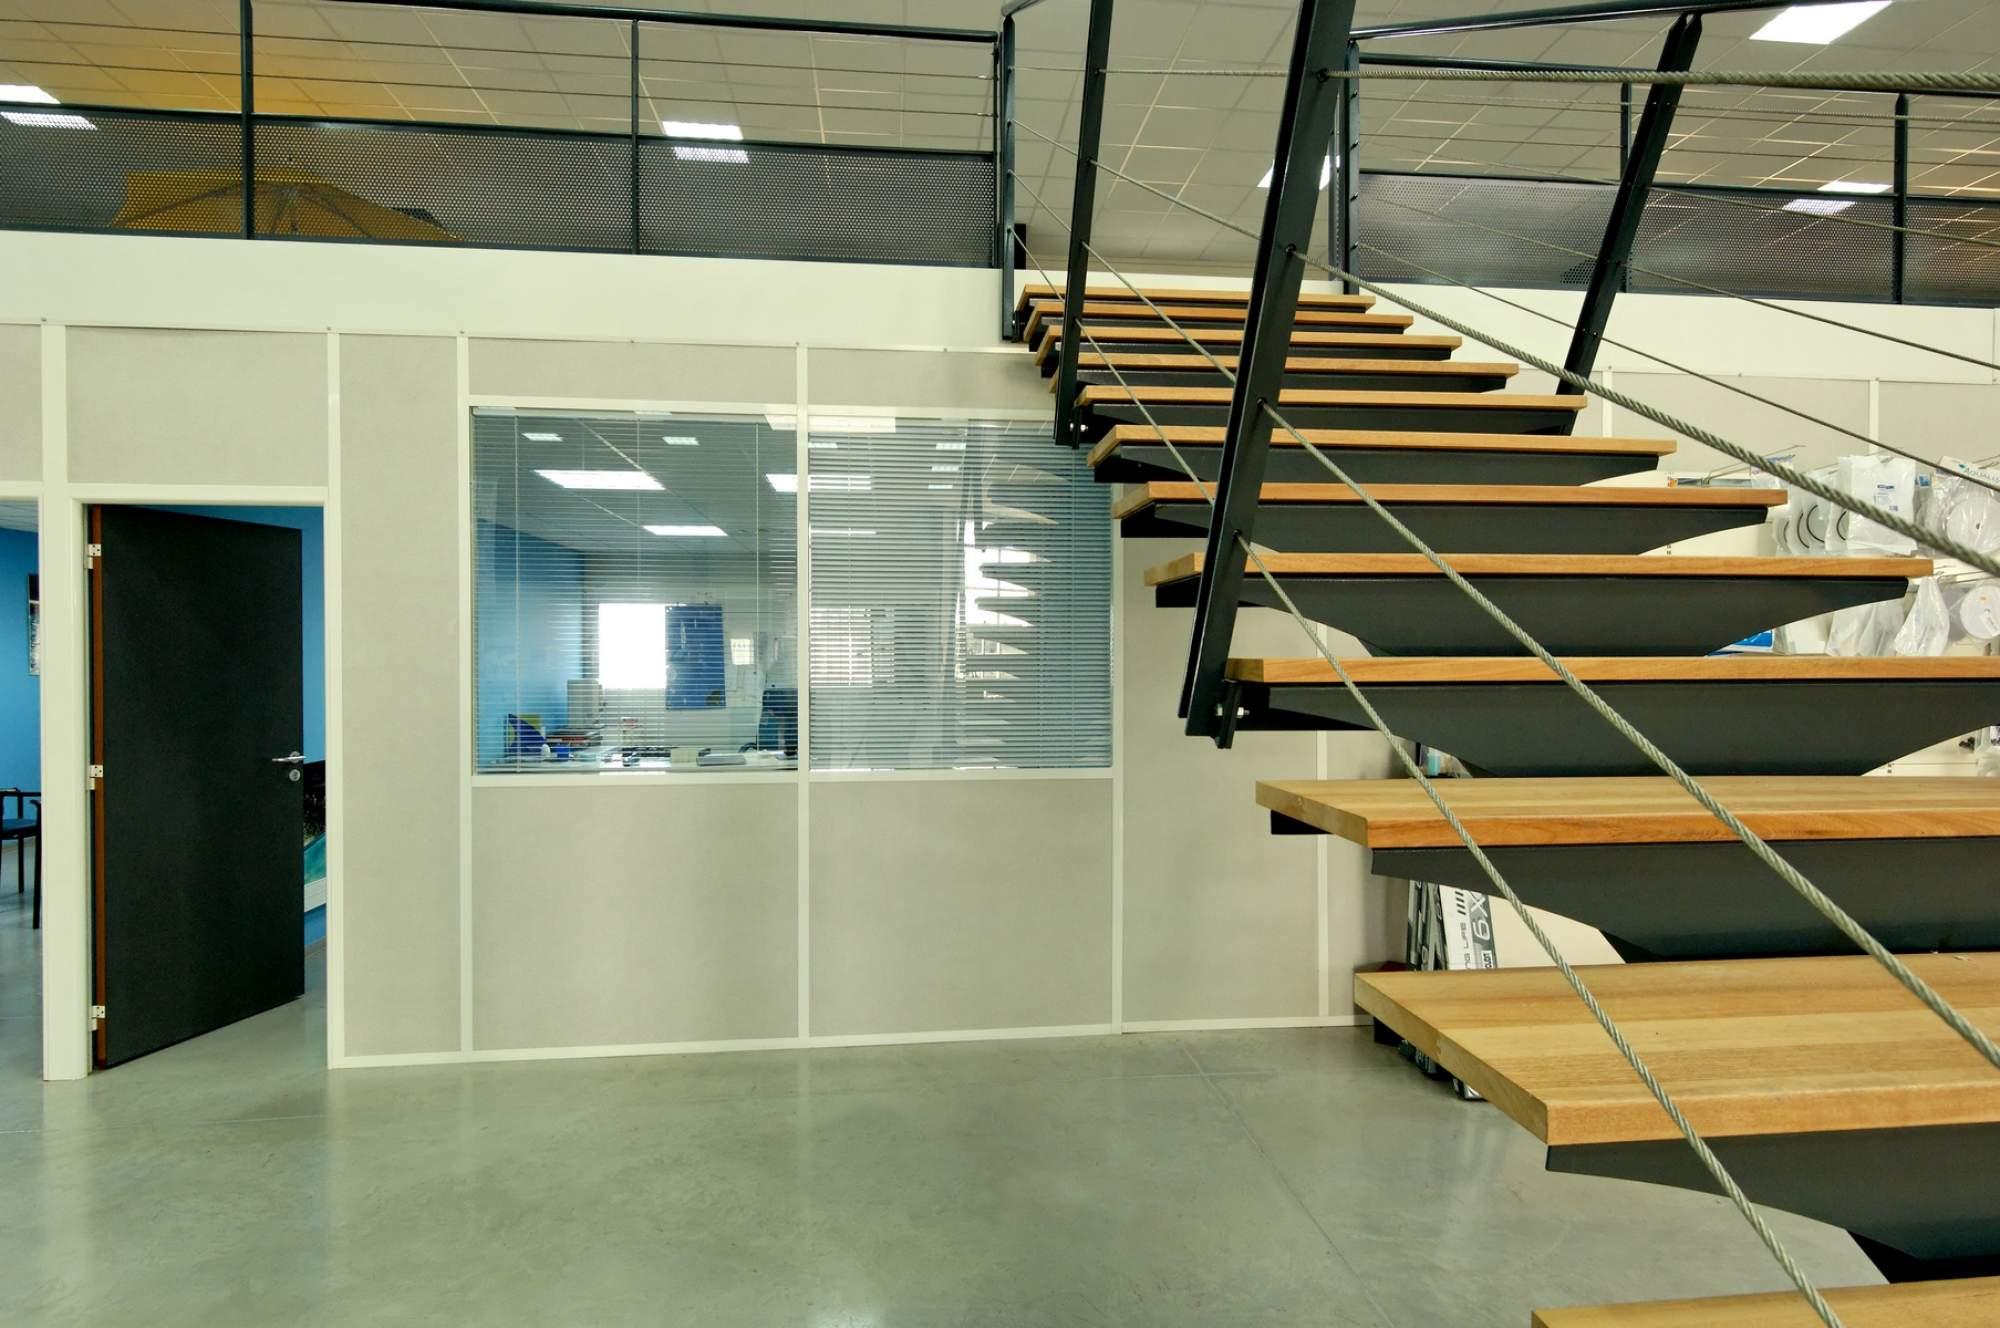 Cloison de bureau amovible vitree semi vitree pleine sur aix